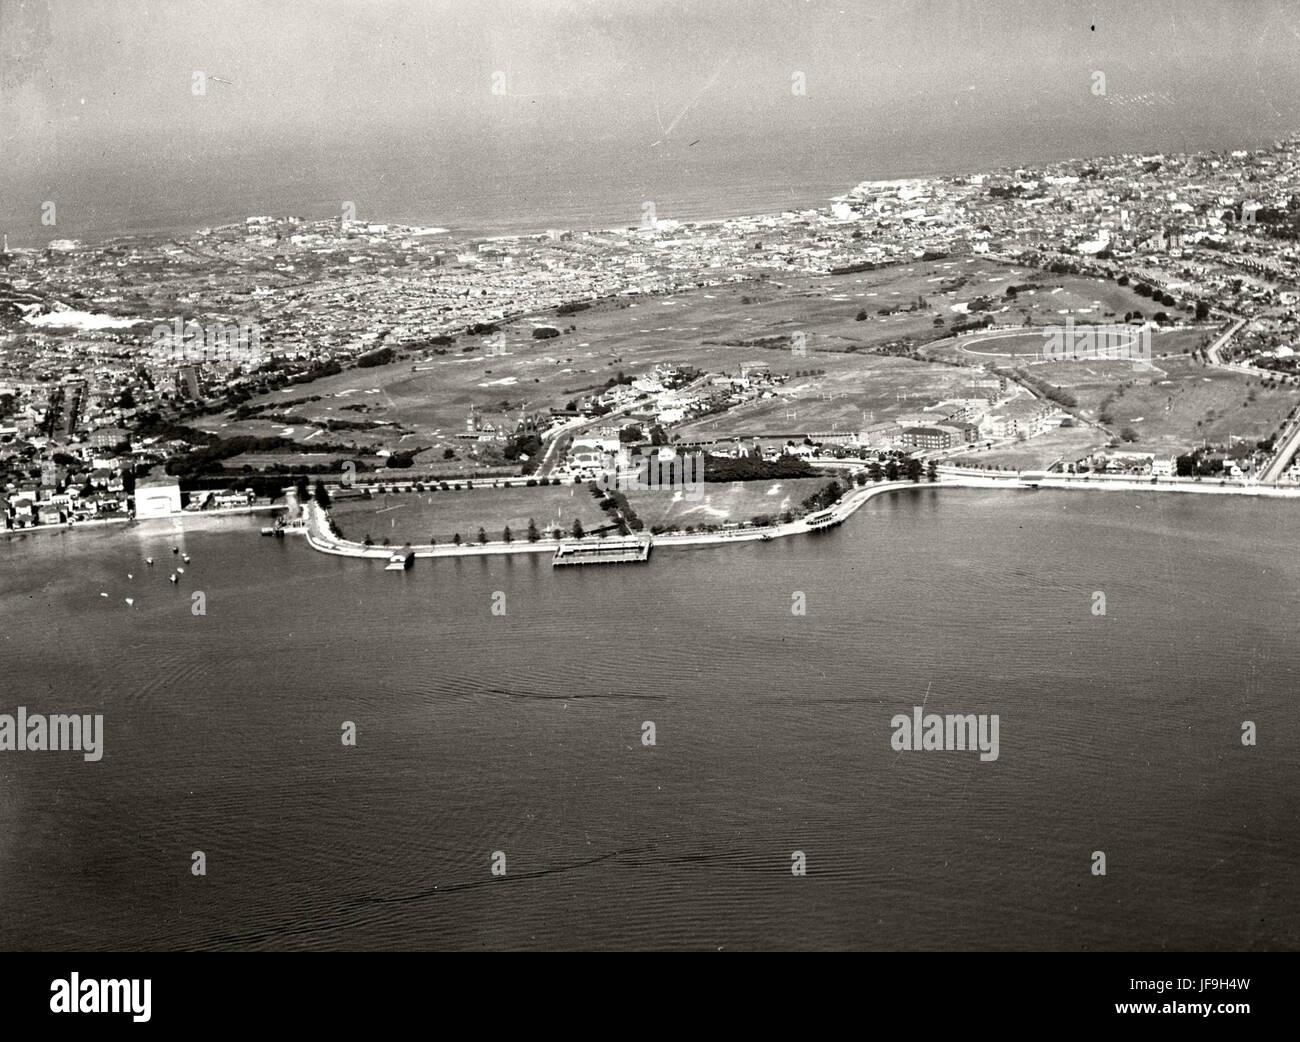 Lyne Park Rose Bay - 27 July 1937 30163423975 o - Stock Image